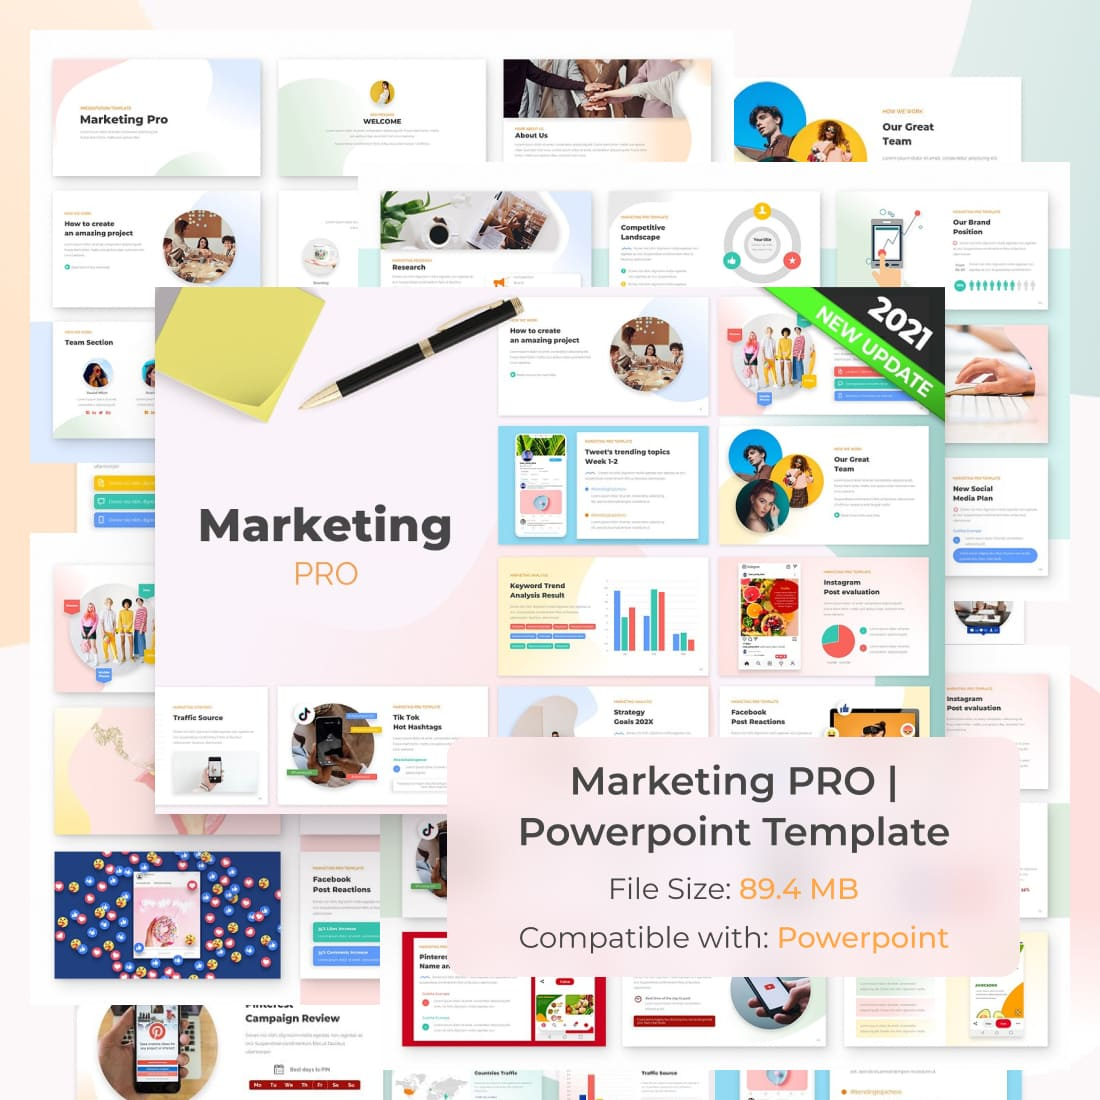 Marketing PRO Powerpoint Template by MasterBundles.